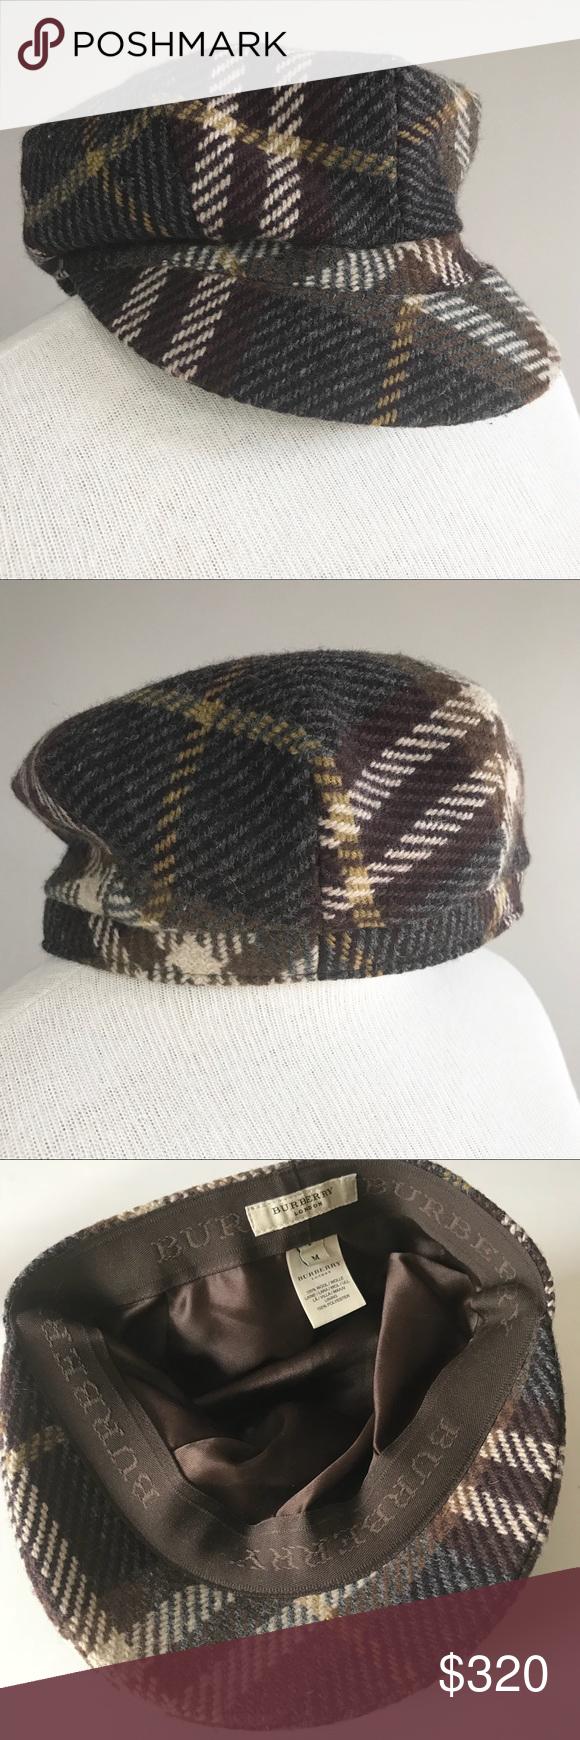 Burberry wool brown plaid newsboy cabbie cap hat M Burberry London cap hat  size medium Authentic fd4039da610d